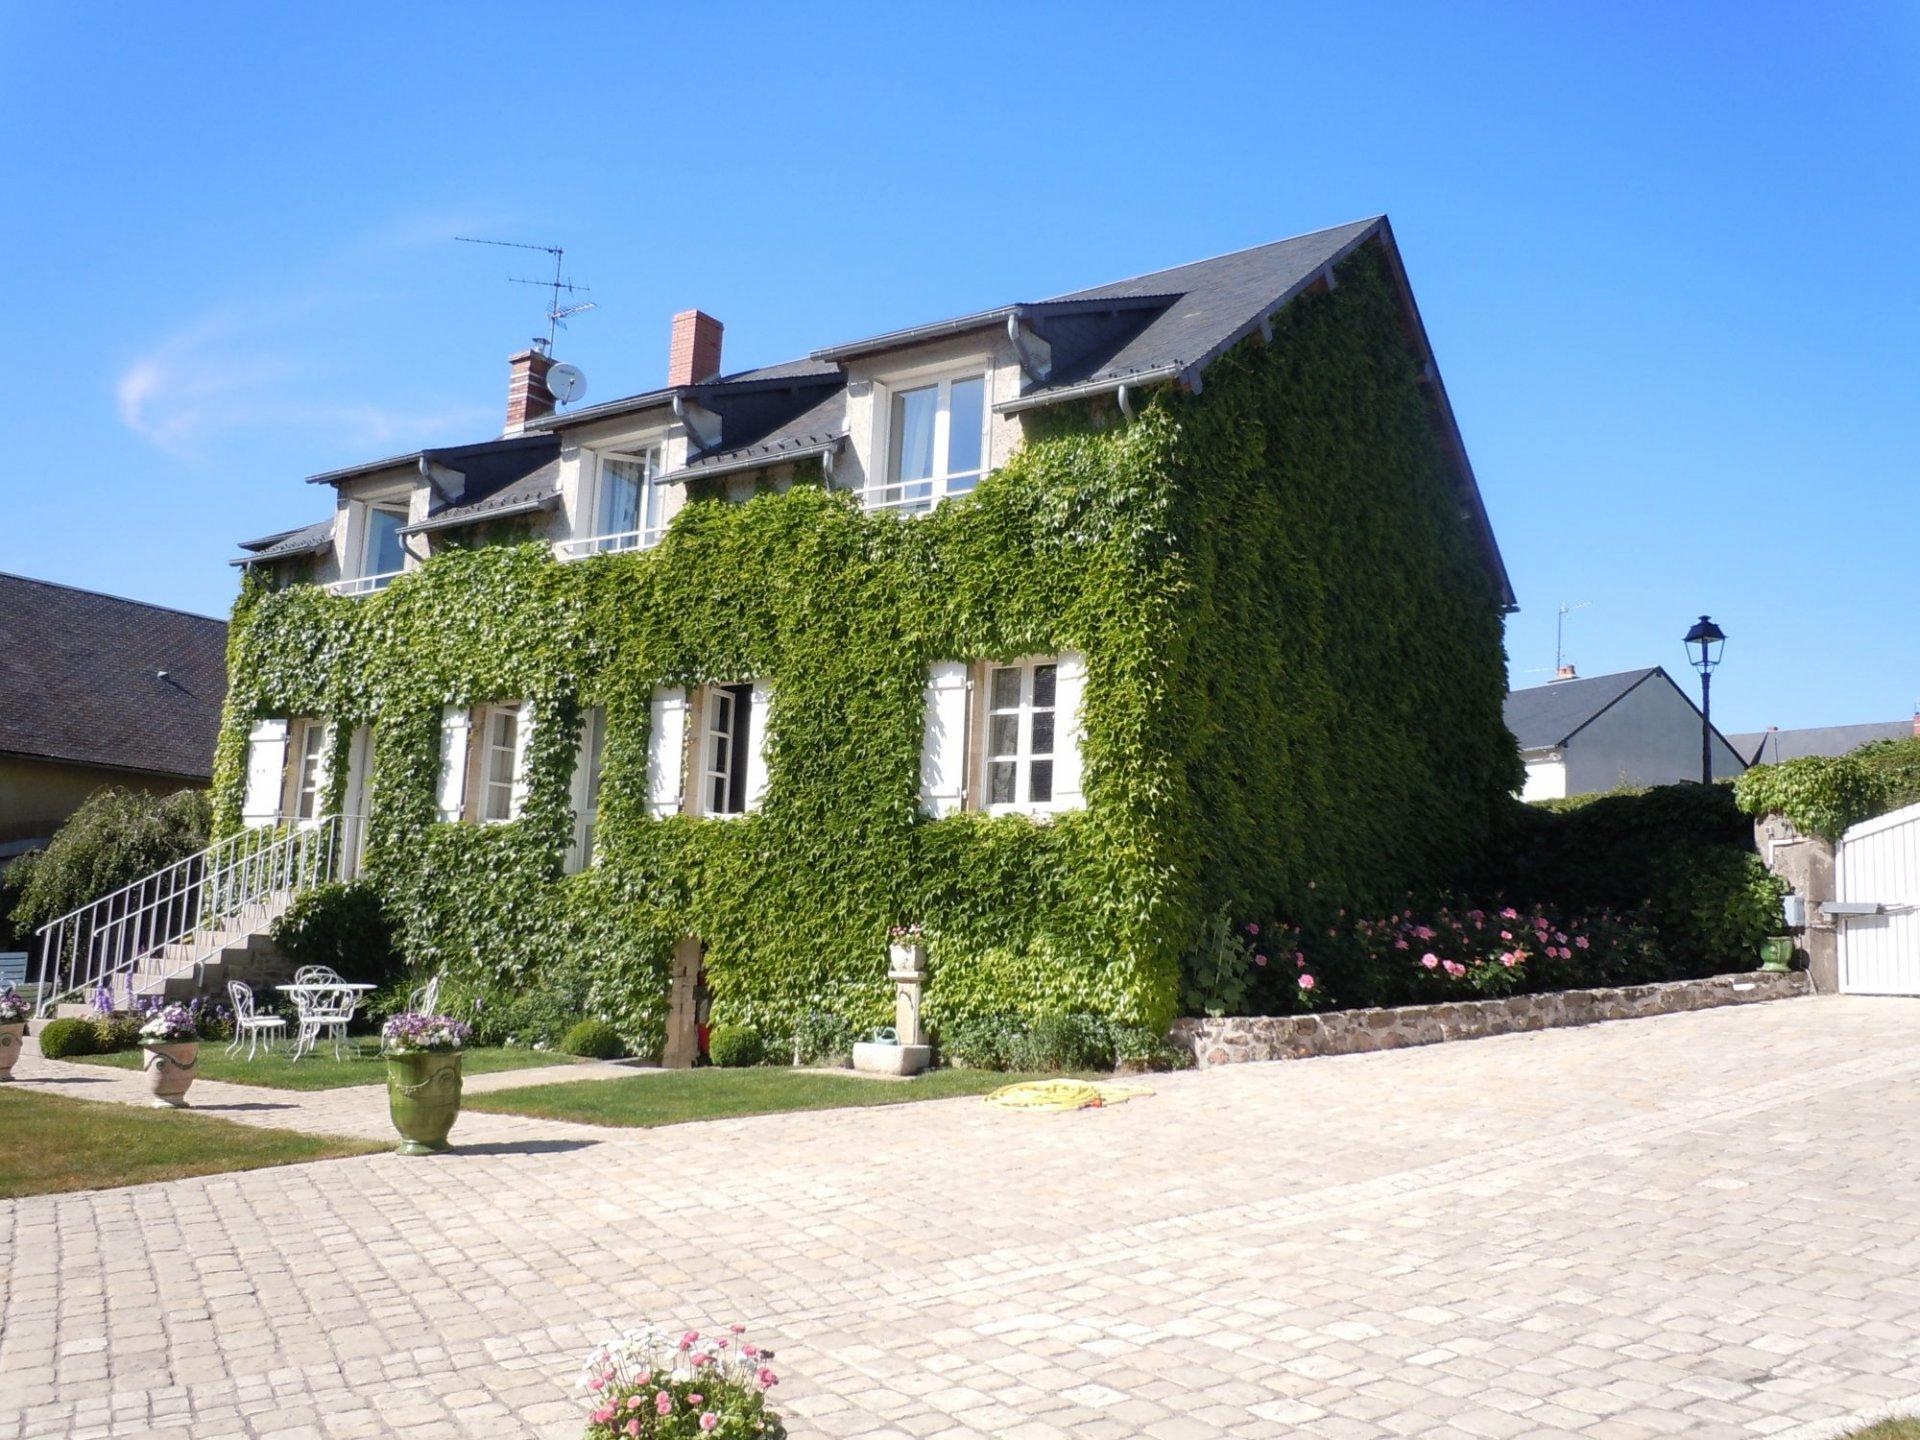 Chateau Chinon - Morvan. Schitterend imposant woonhuis.